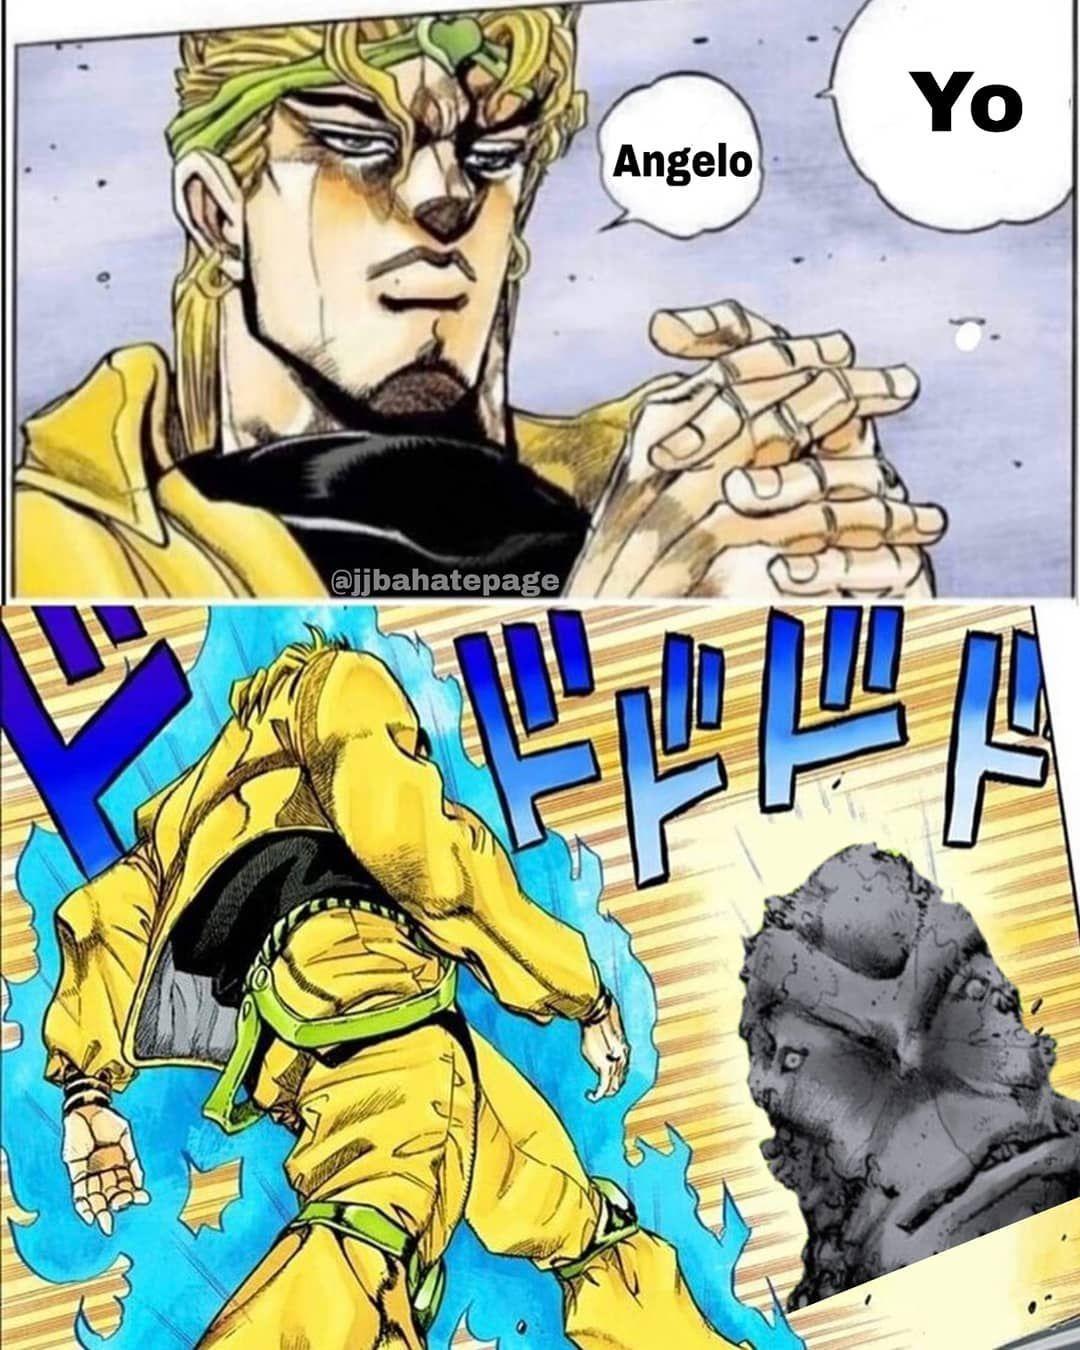 Grrak U Yo Angelo Is This Meme Still Relevant Meme On Me Me